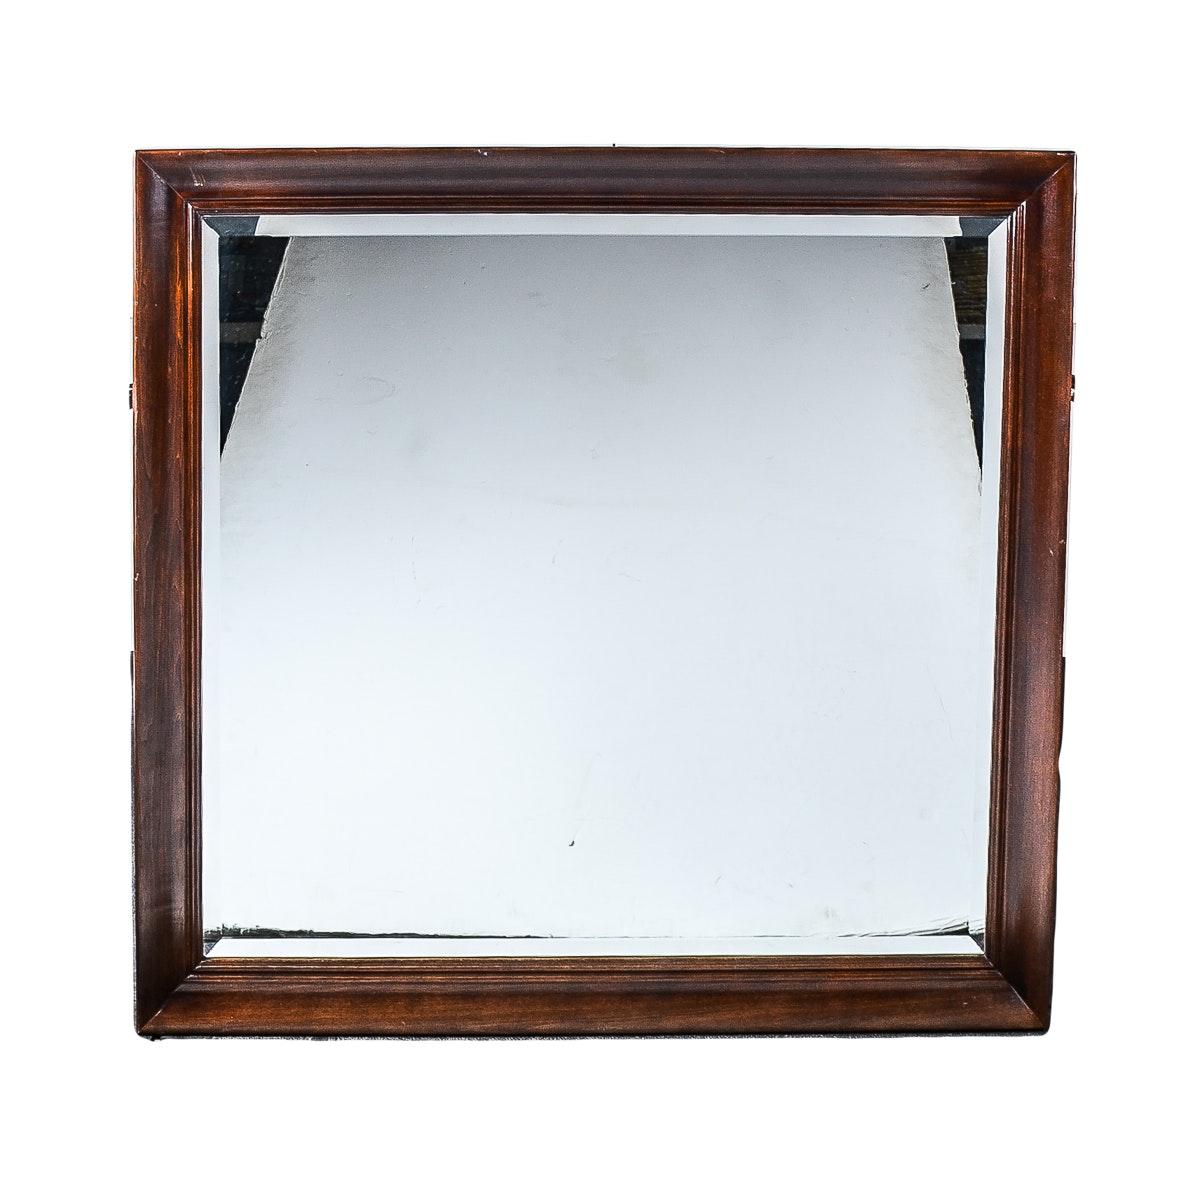 Wooden Framed Beveled Wall Mirror